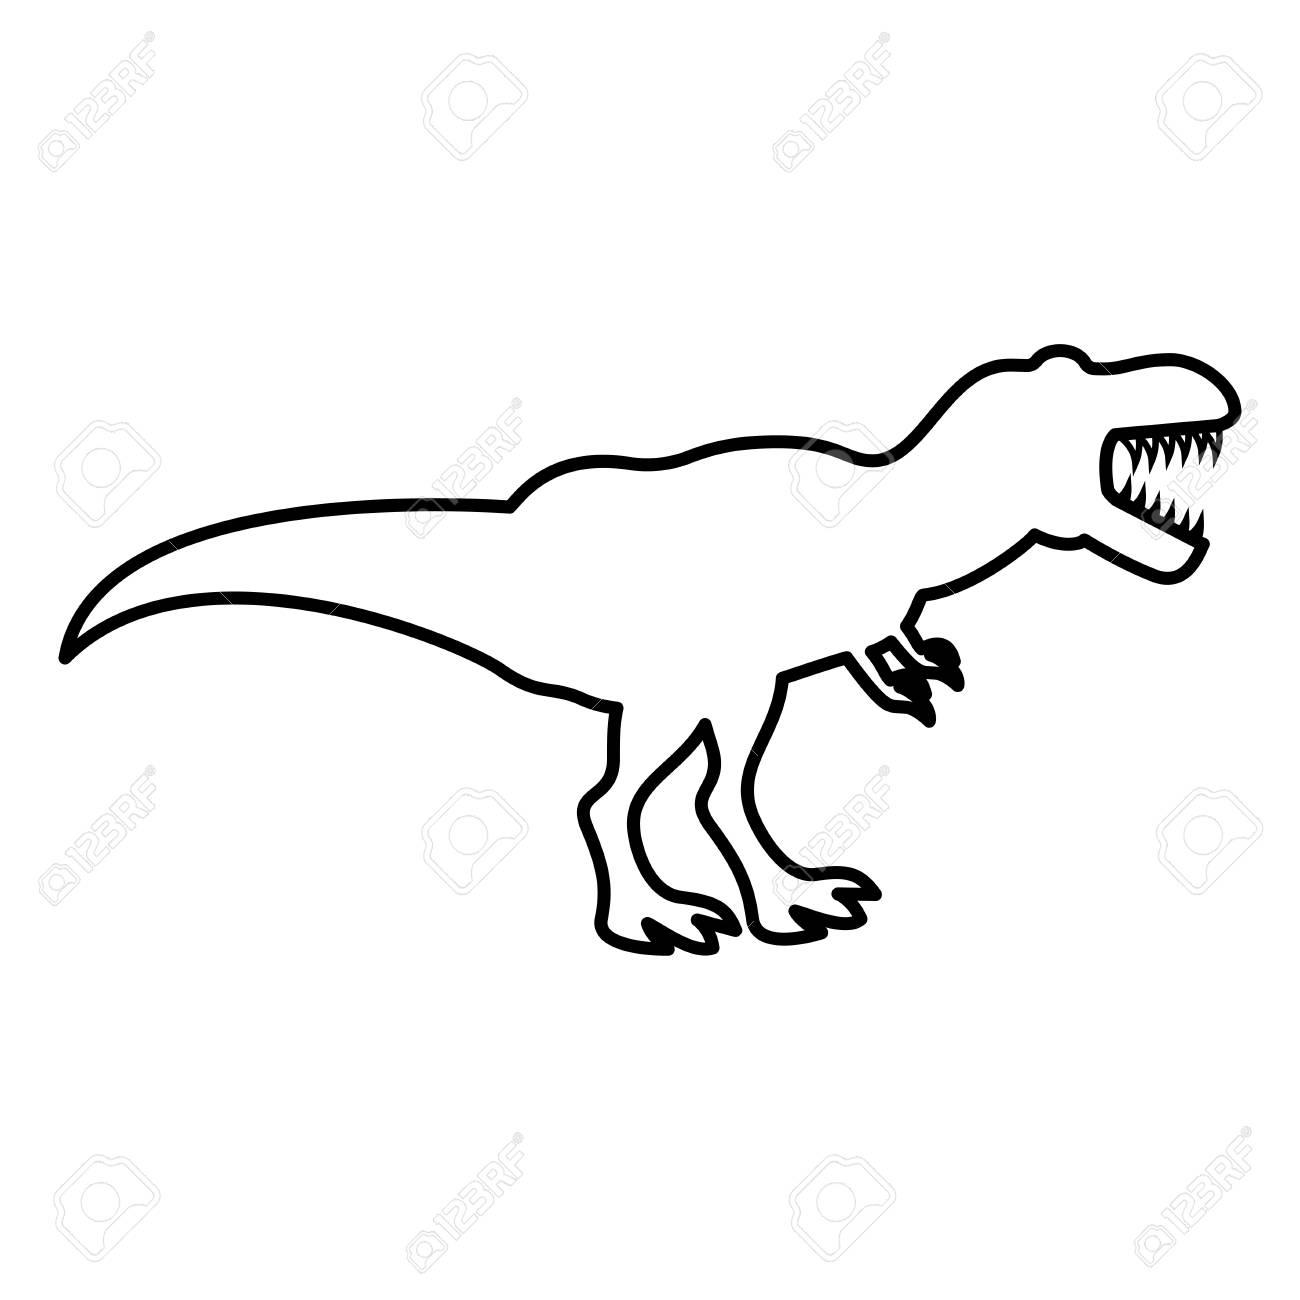 Dinosaur tyrannosaurus t rex icon black color vector illustration flat style outline - 101082210